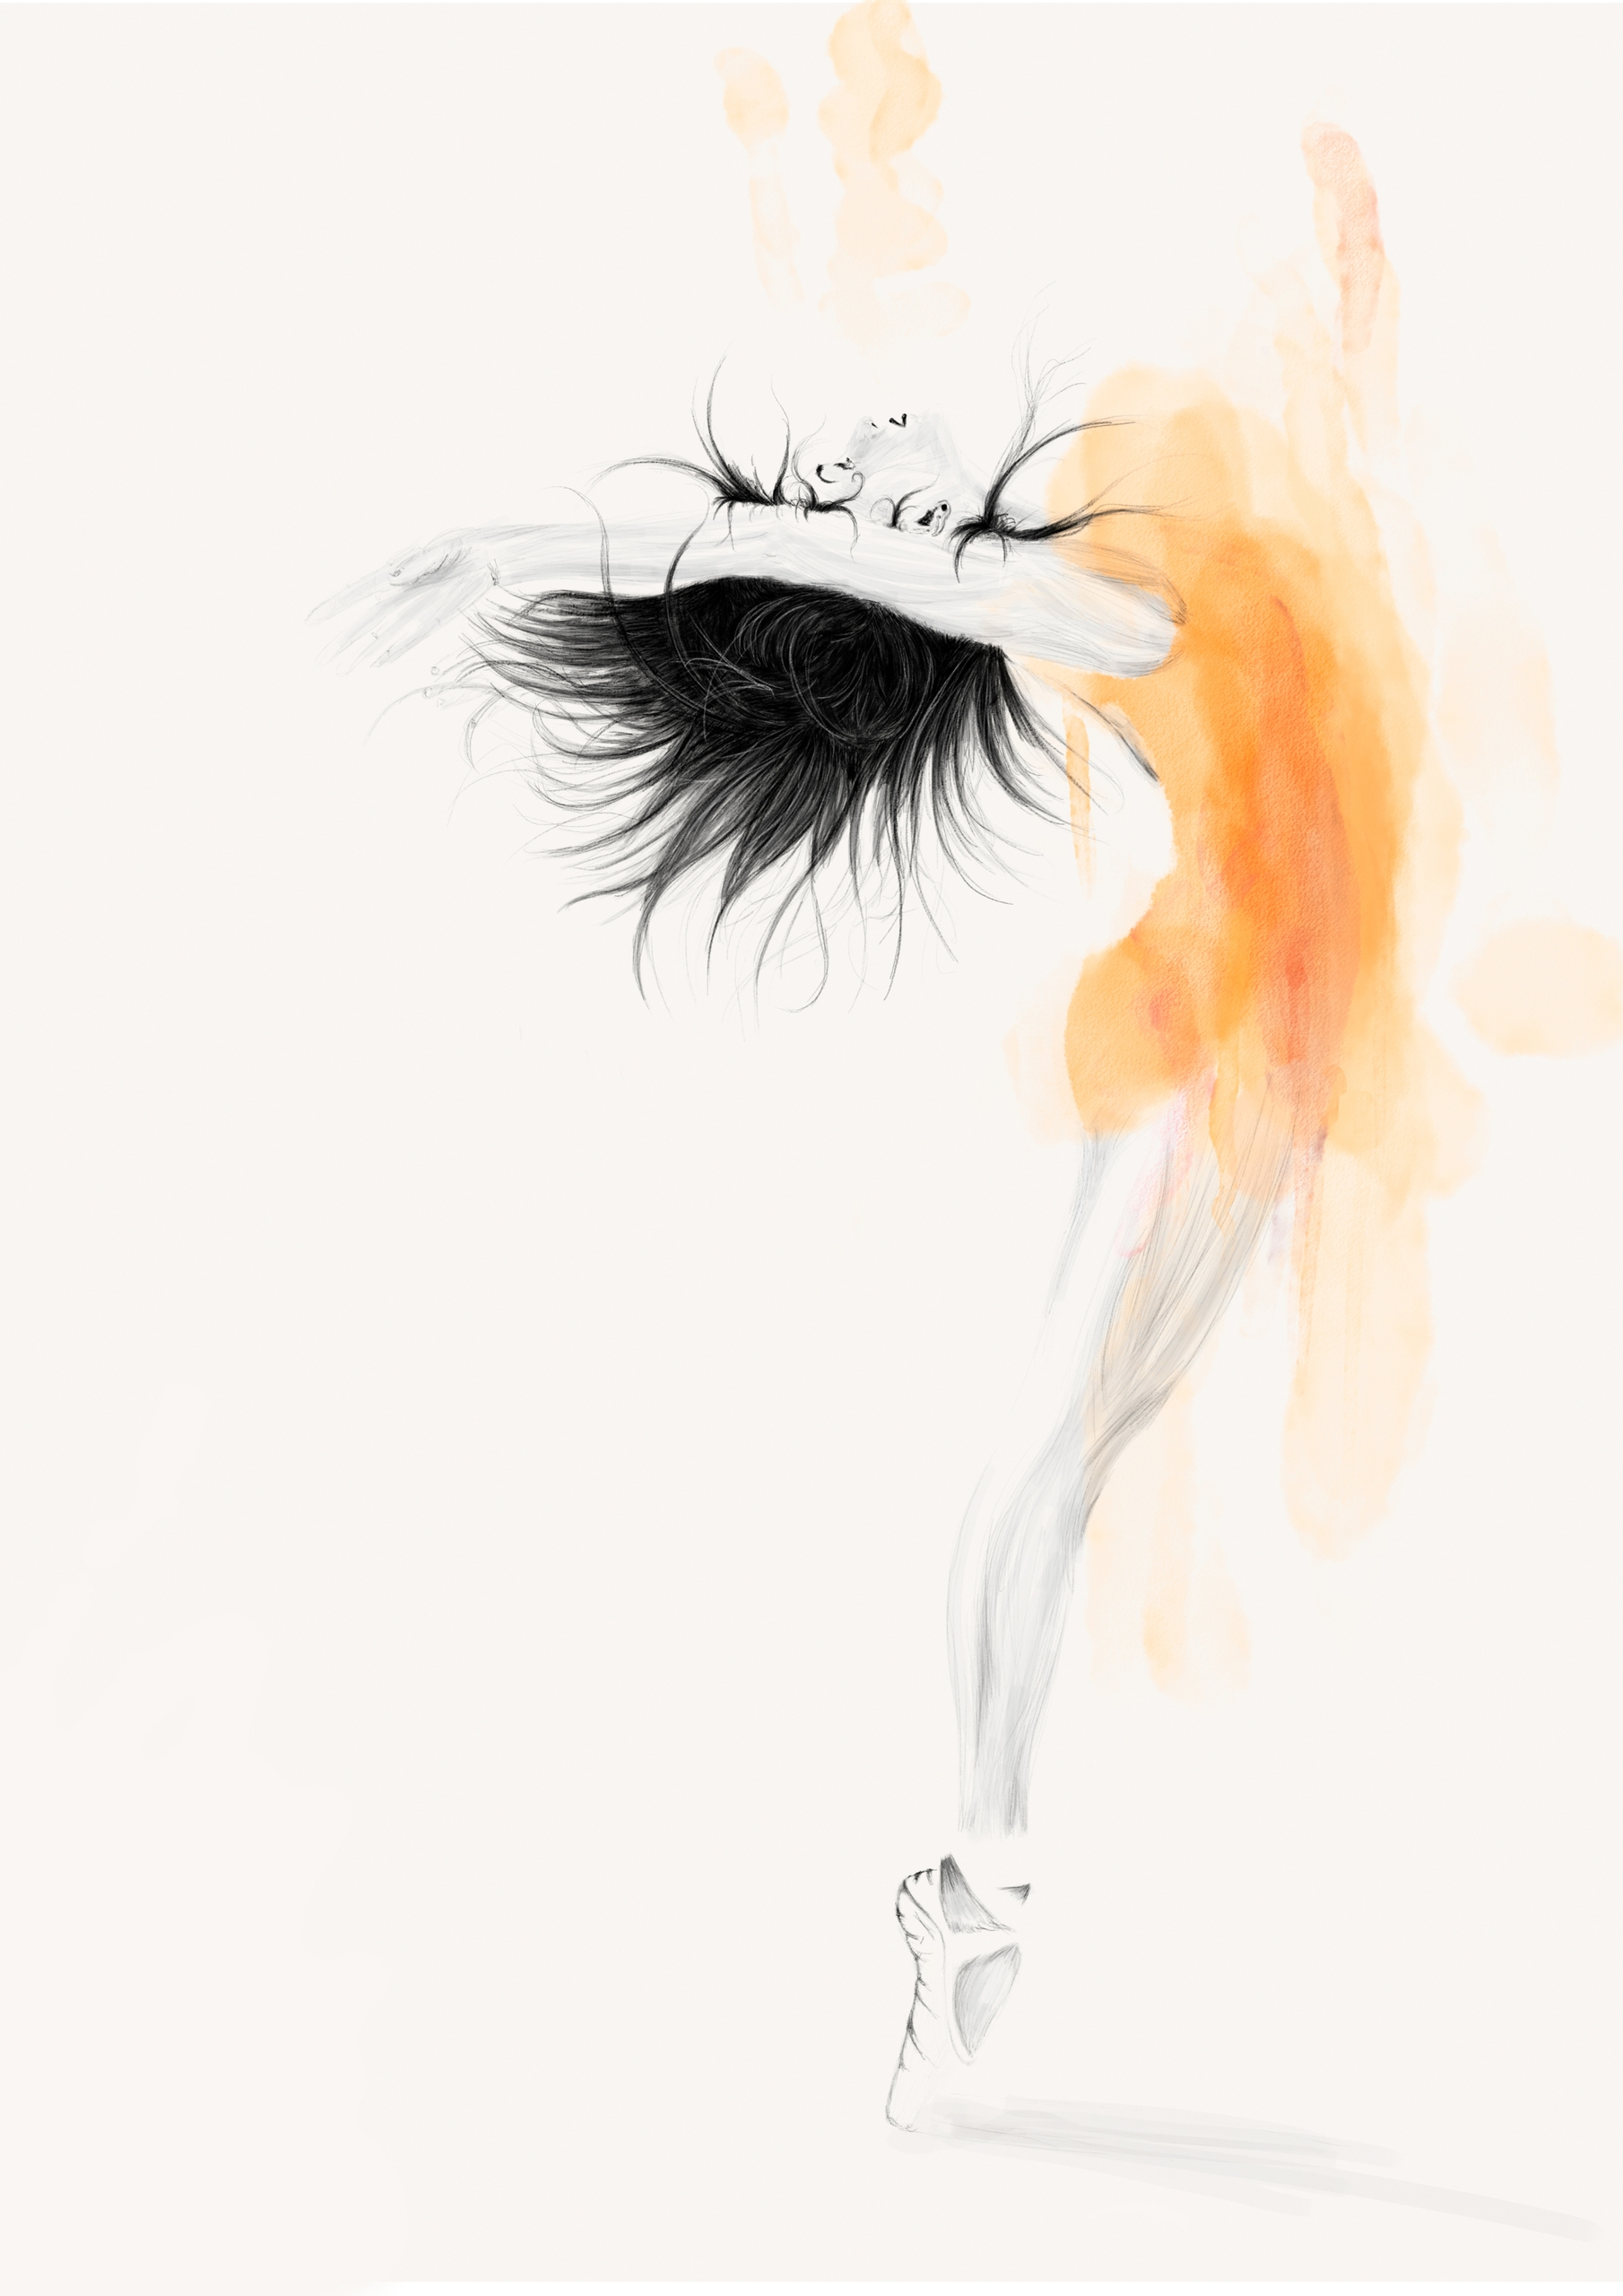 ballet - illustration, drawing, painting - odinantonsen   ello